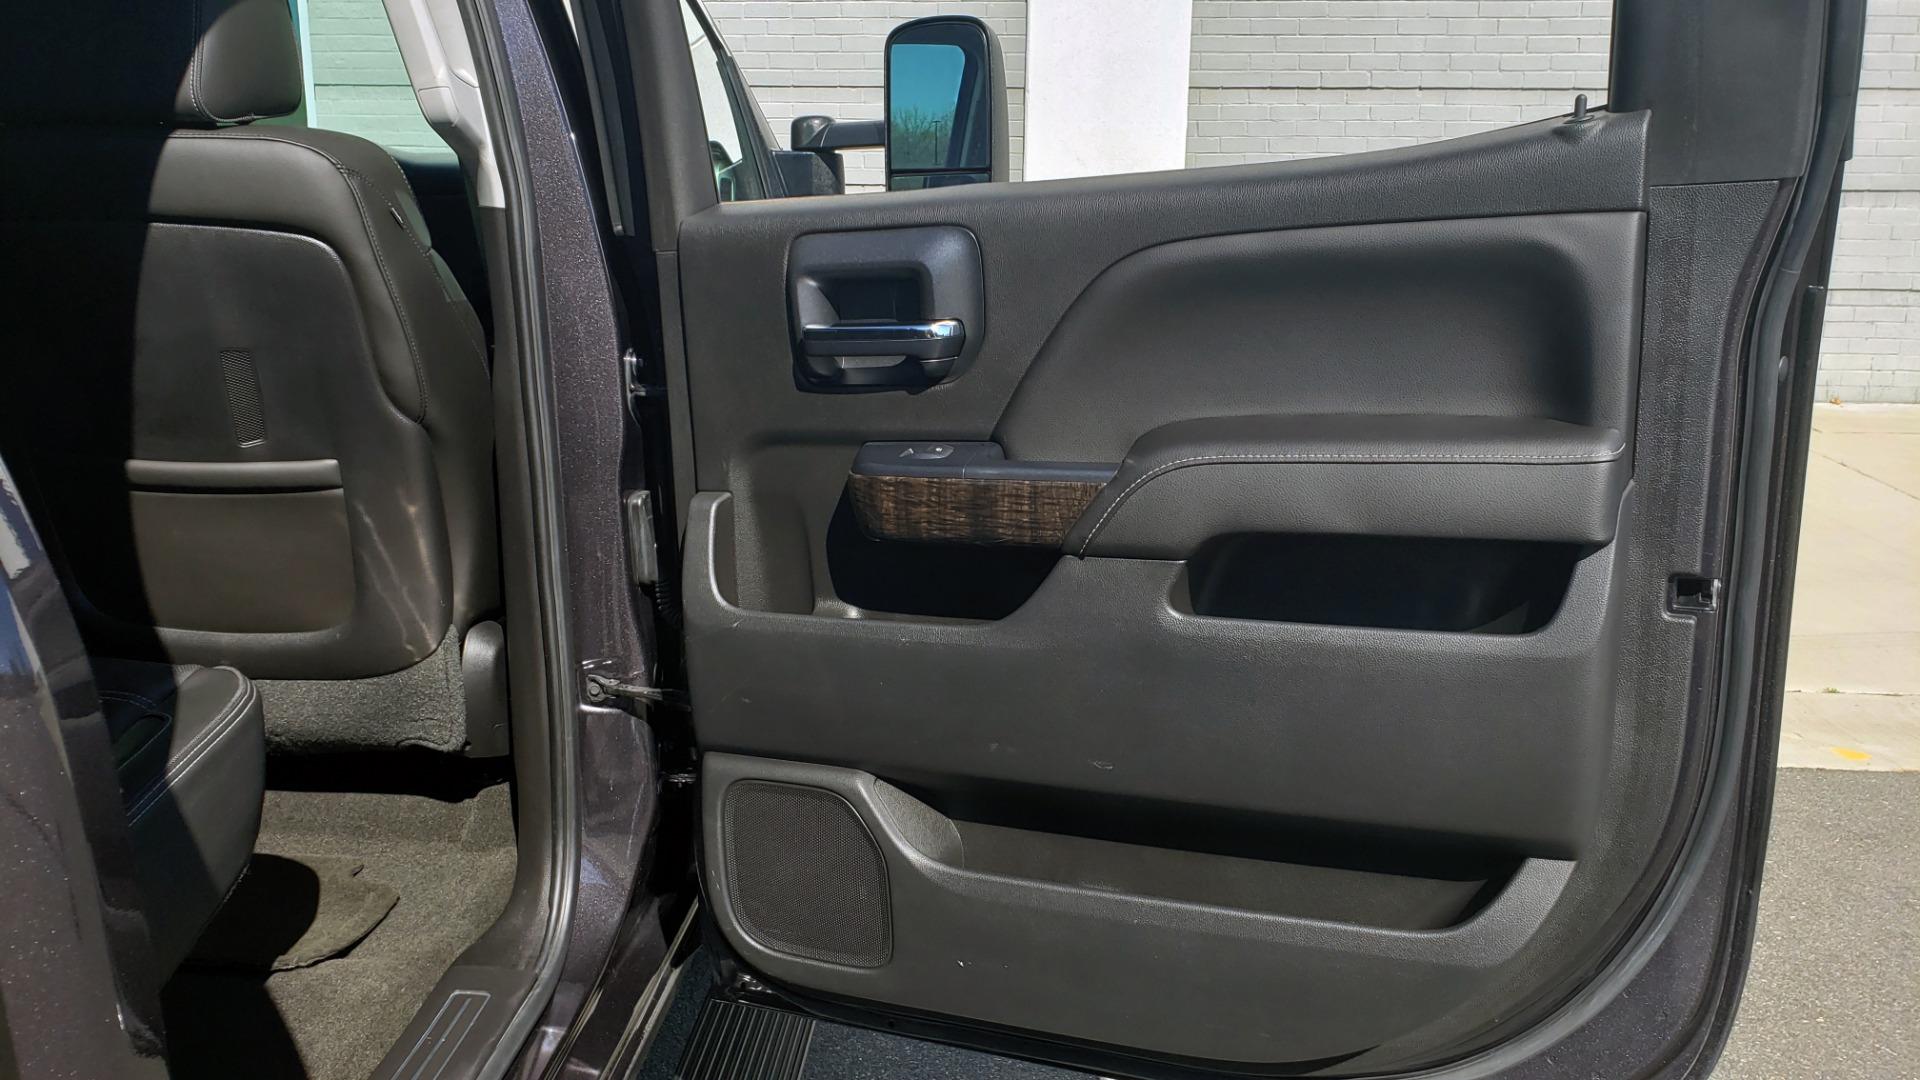 Used 2015 GMC SIERRA 2500HD DENALI 4WD CREWCAB / 6.6L DURAMAX / 6-SPD AUTO / NAV / BOSE for sale $50,995 at Formula Imports in Charlotte NC 28227 79